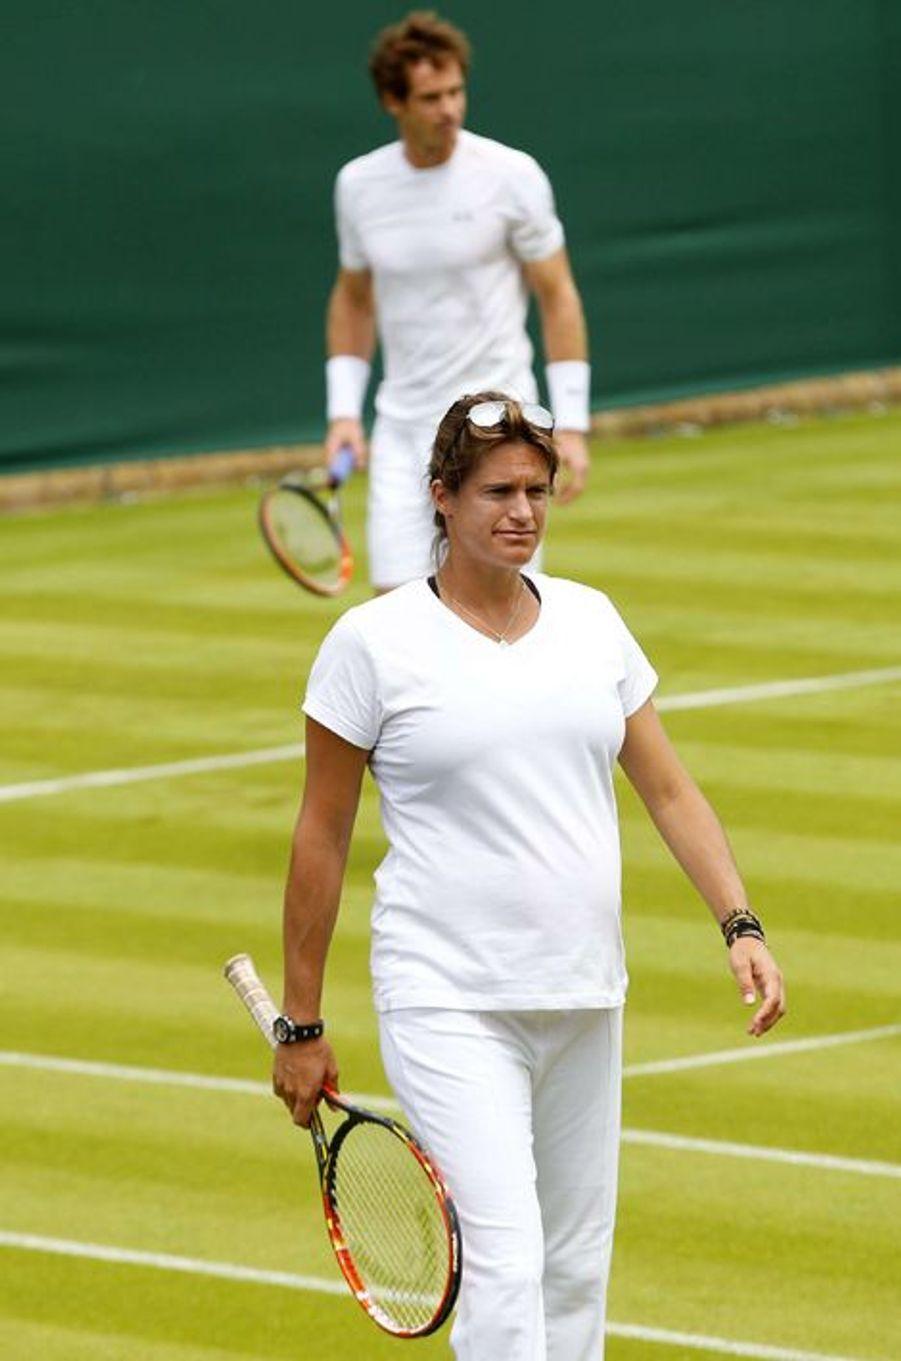 Enceinte, Amélie Mauresmo entraîne Andy Murray pour Wimbledon